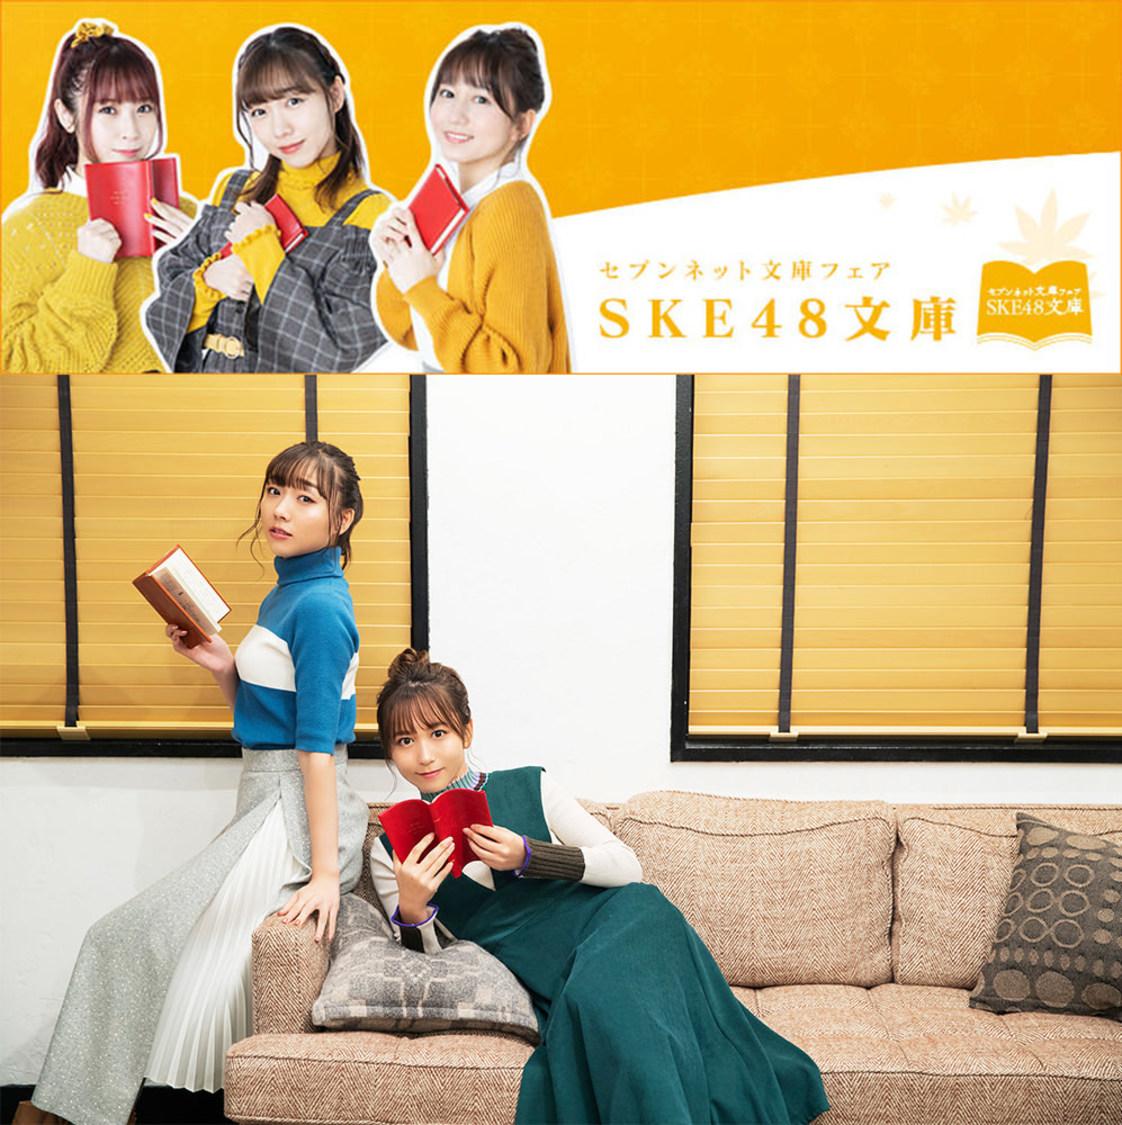 SKE48、セブンネットショッピングコラボした「SKE48文庫」販売開始!